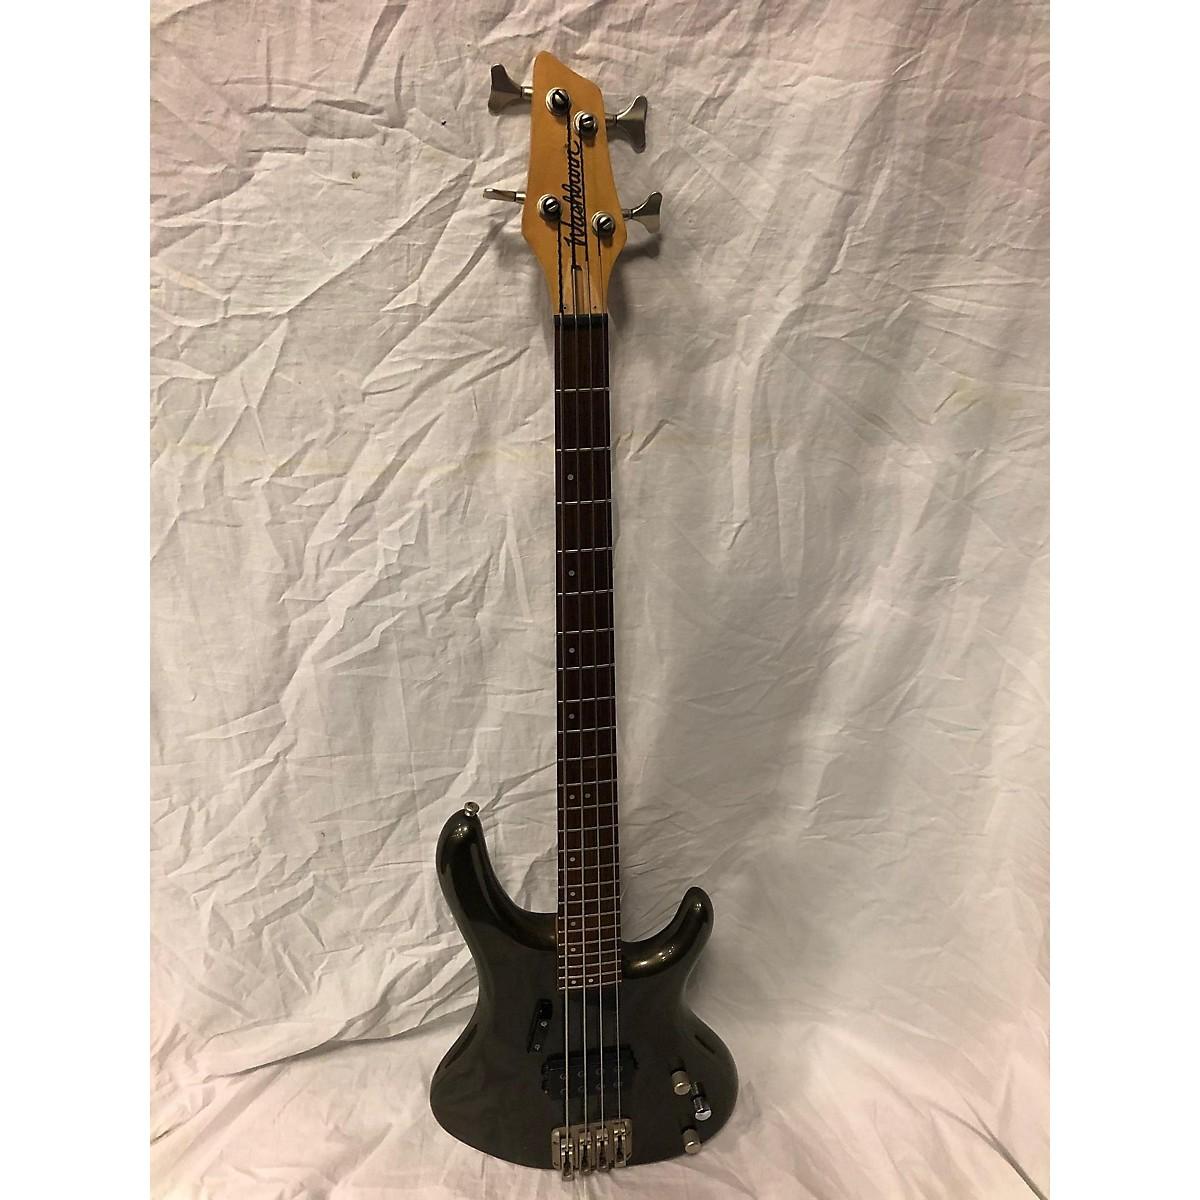 Washburn RB2000 Electric Bass Guitar